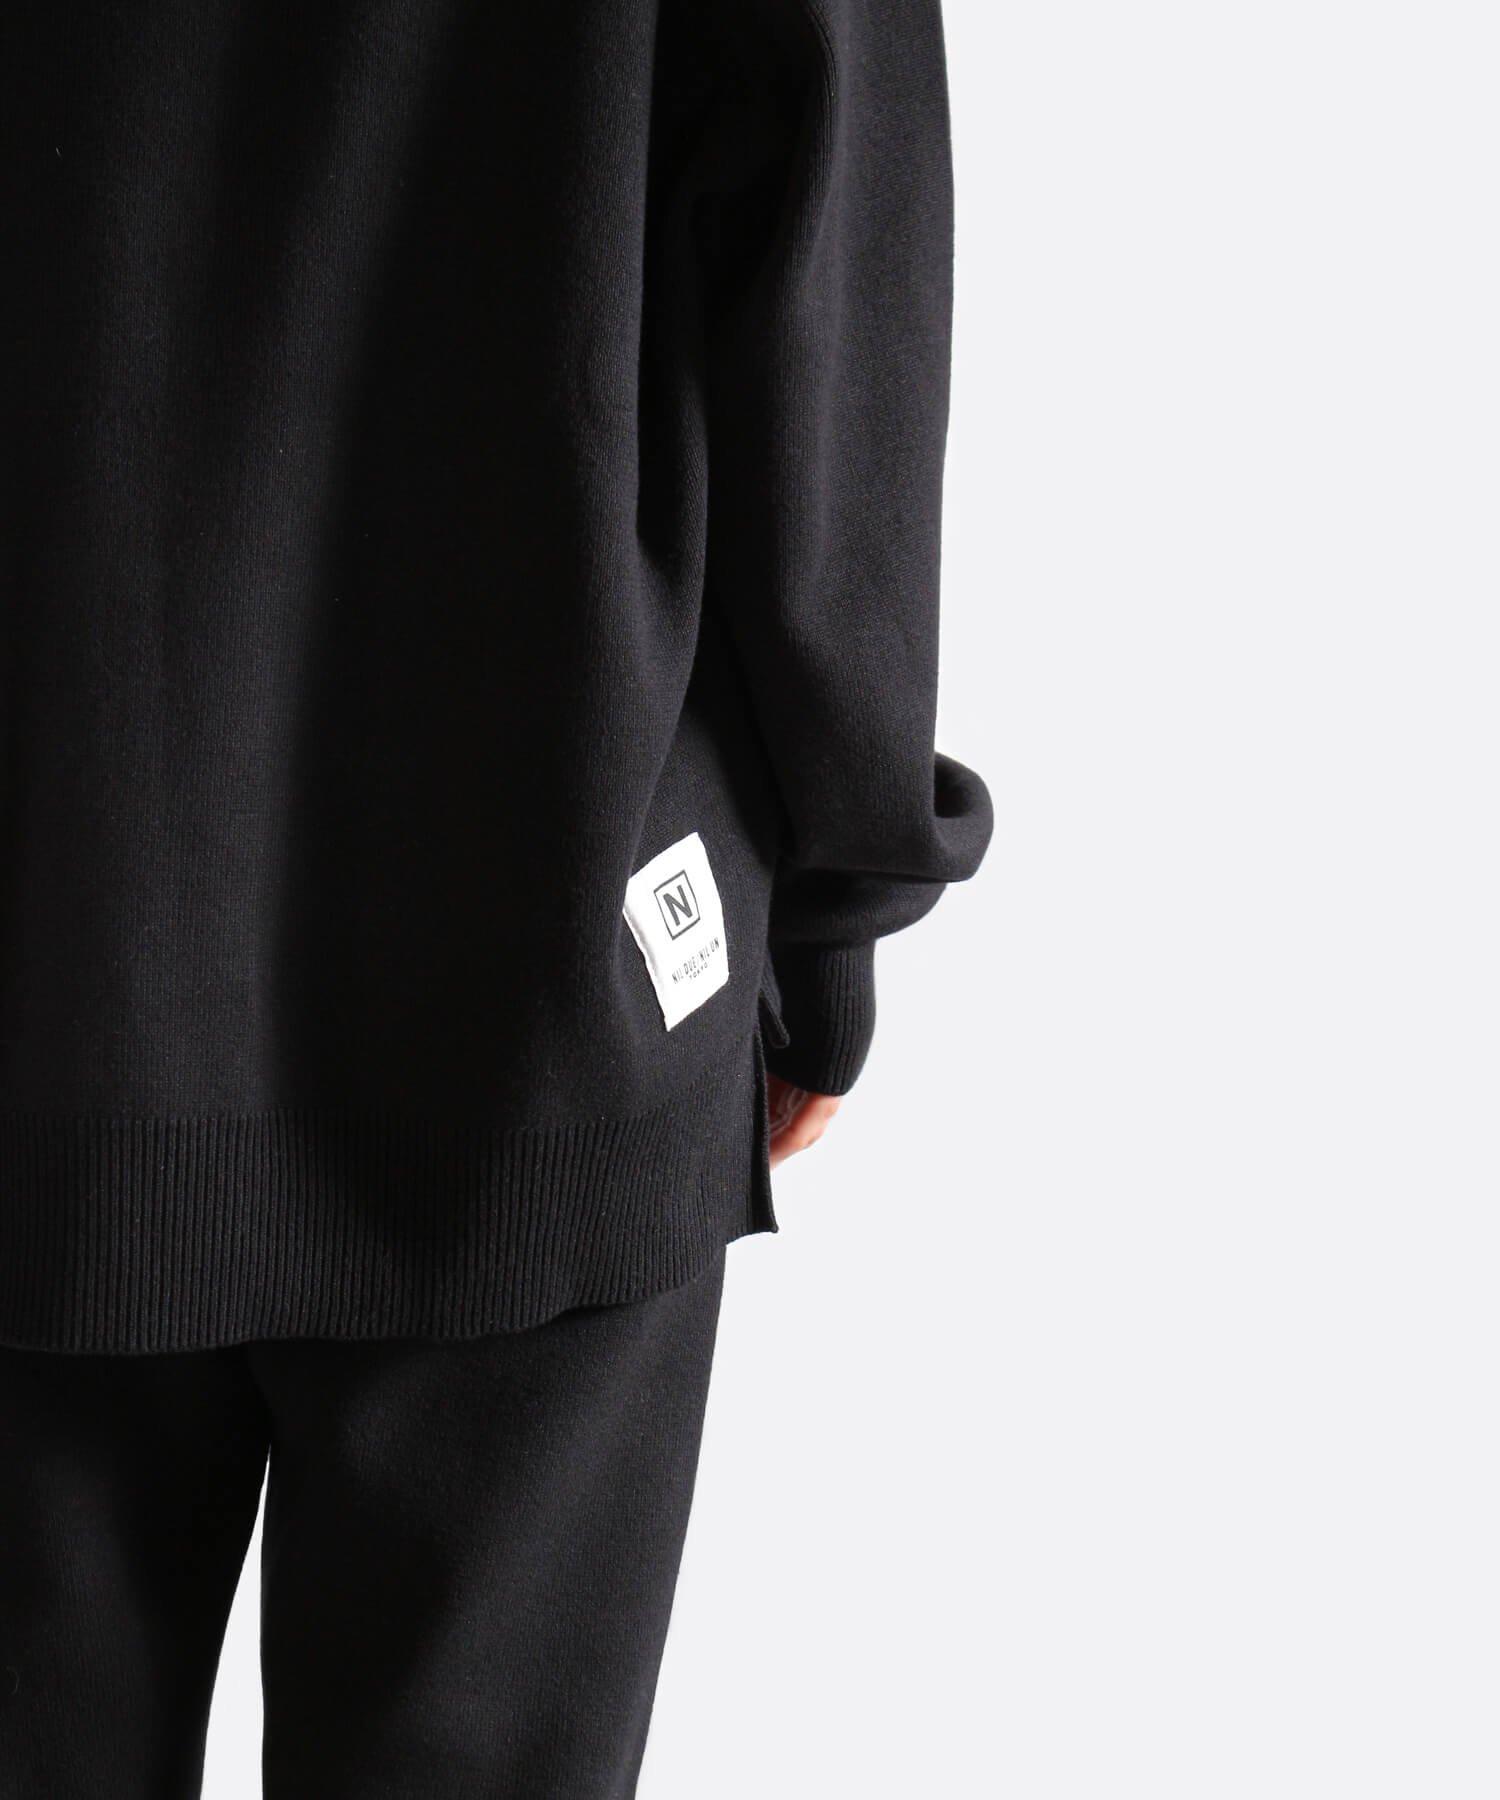 NIL DUE / NIL UN TOKYO / ニル デュエ / ニル アン トーキョー | RIB KNIT LOUNGE SET (BLACK) 商品画像26